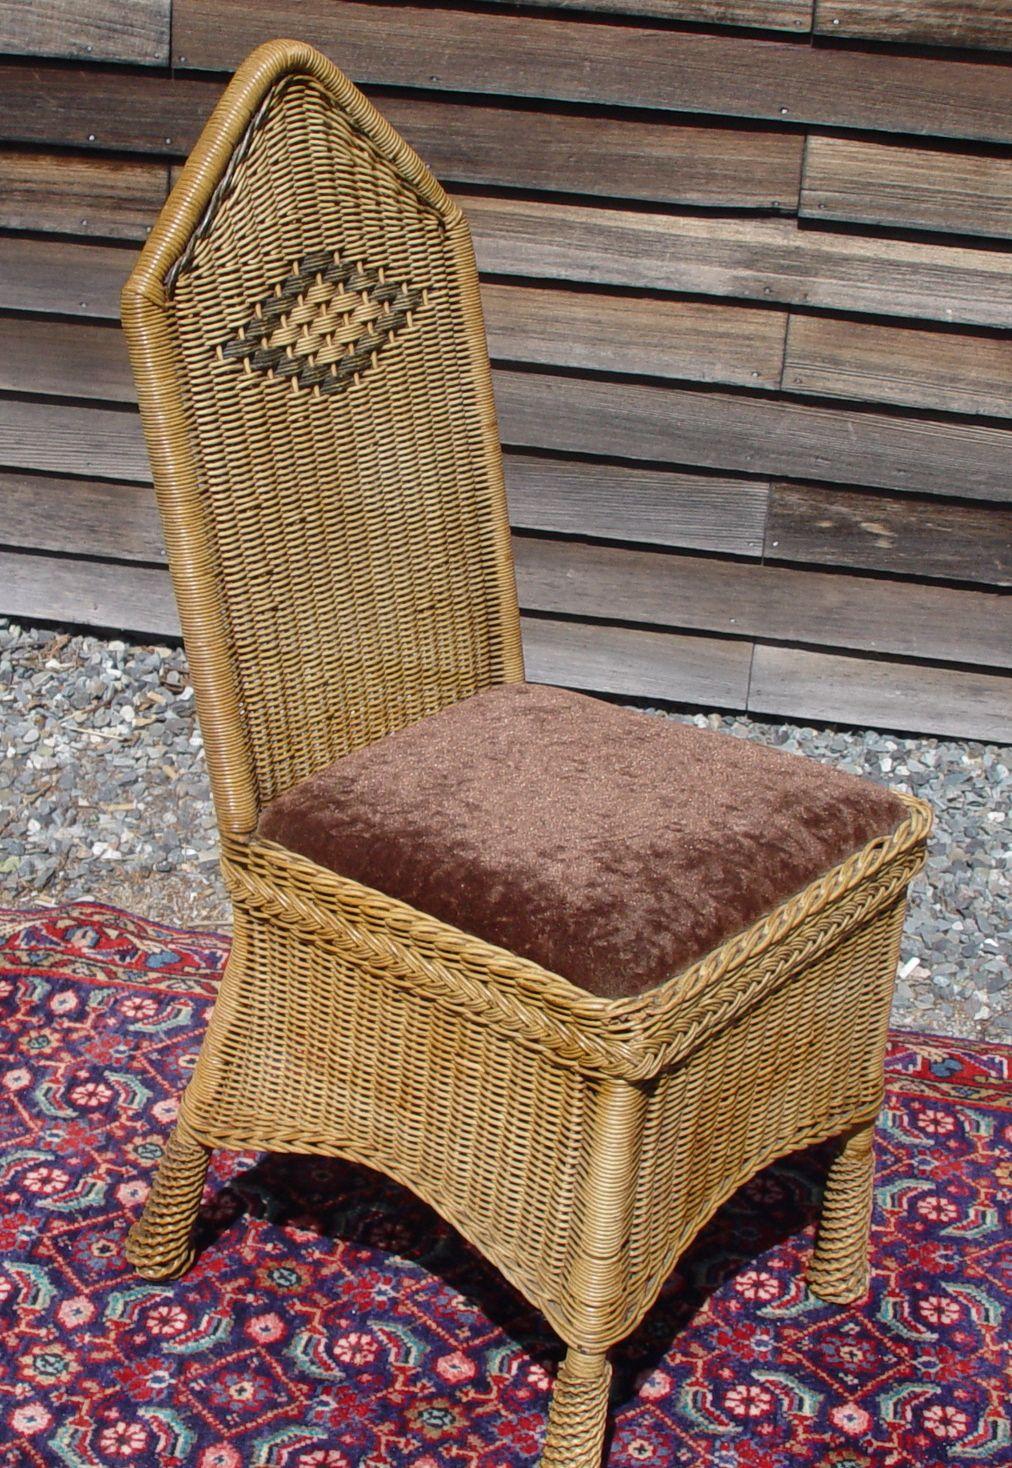 rattan wicker chair repair